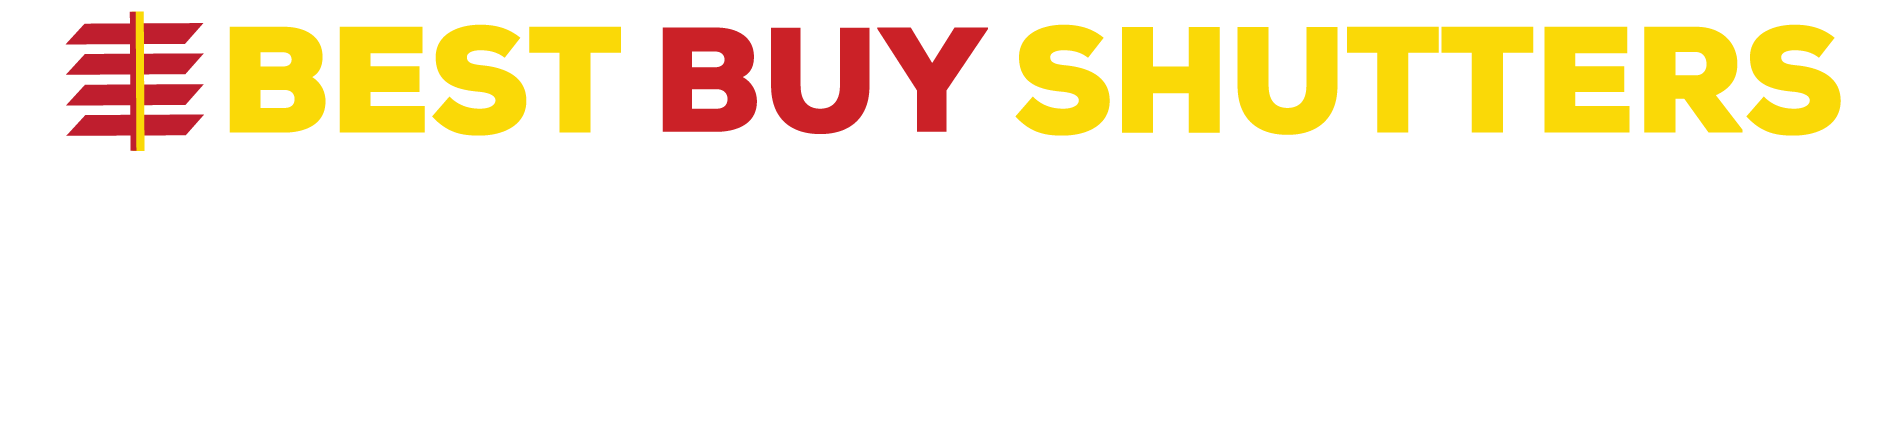 Best Buy Shuttters